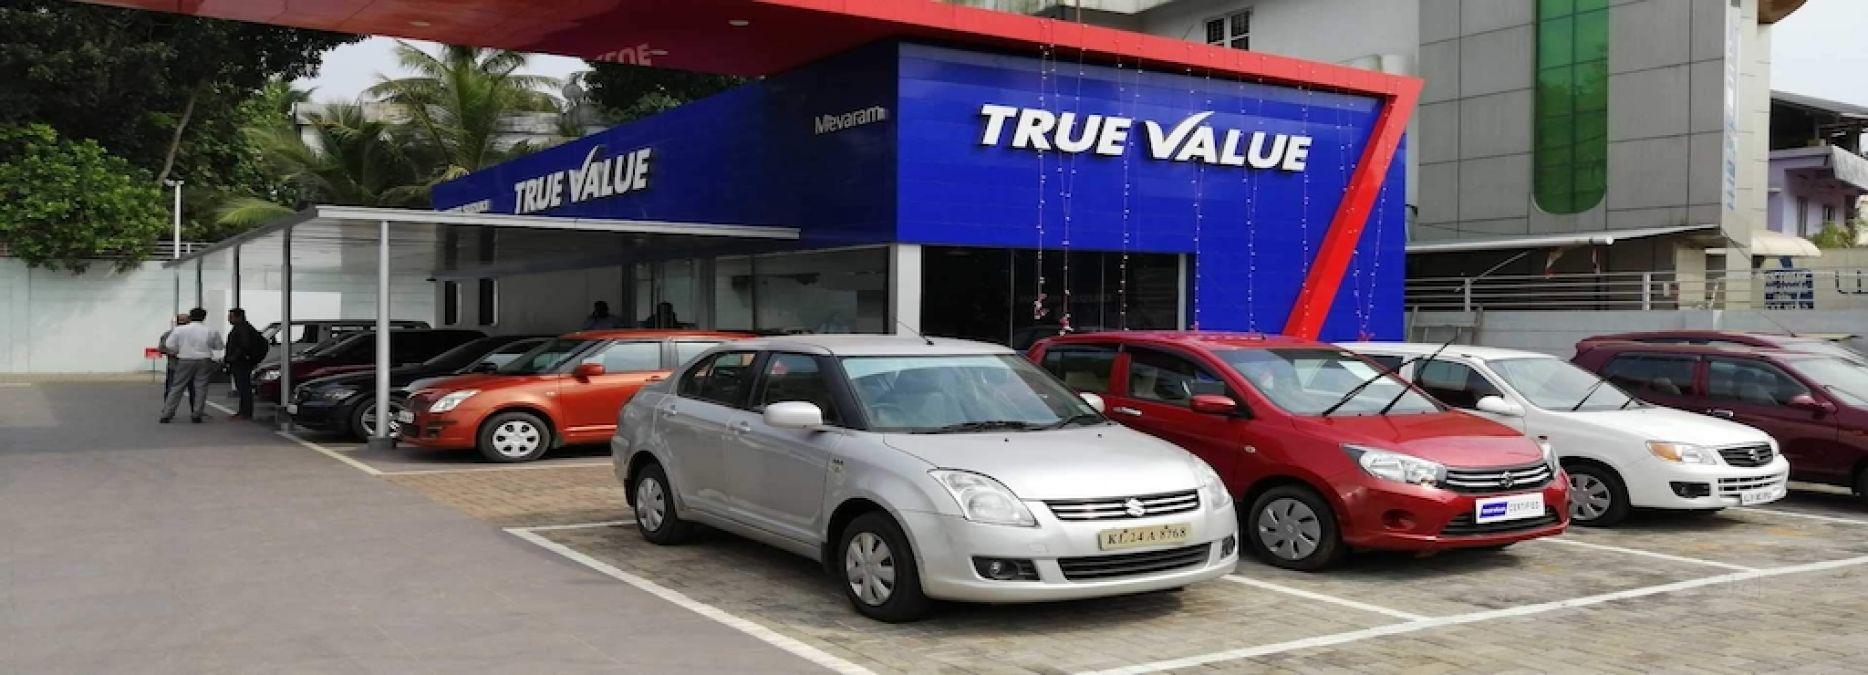 Maruti Suzuki True Value Achieved Huge Success, Sales of Old Cars Increased